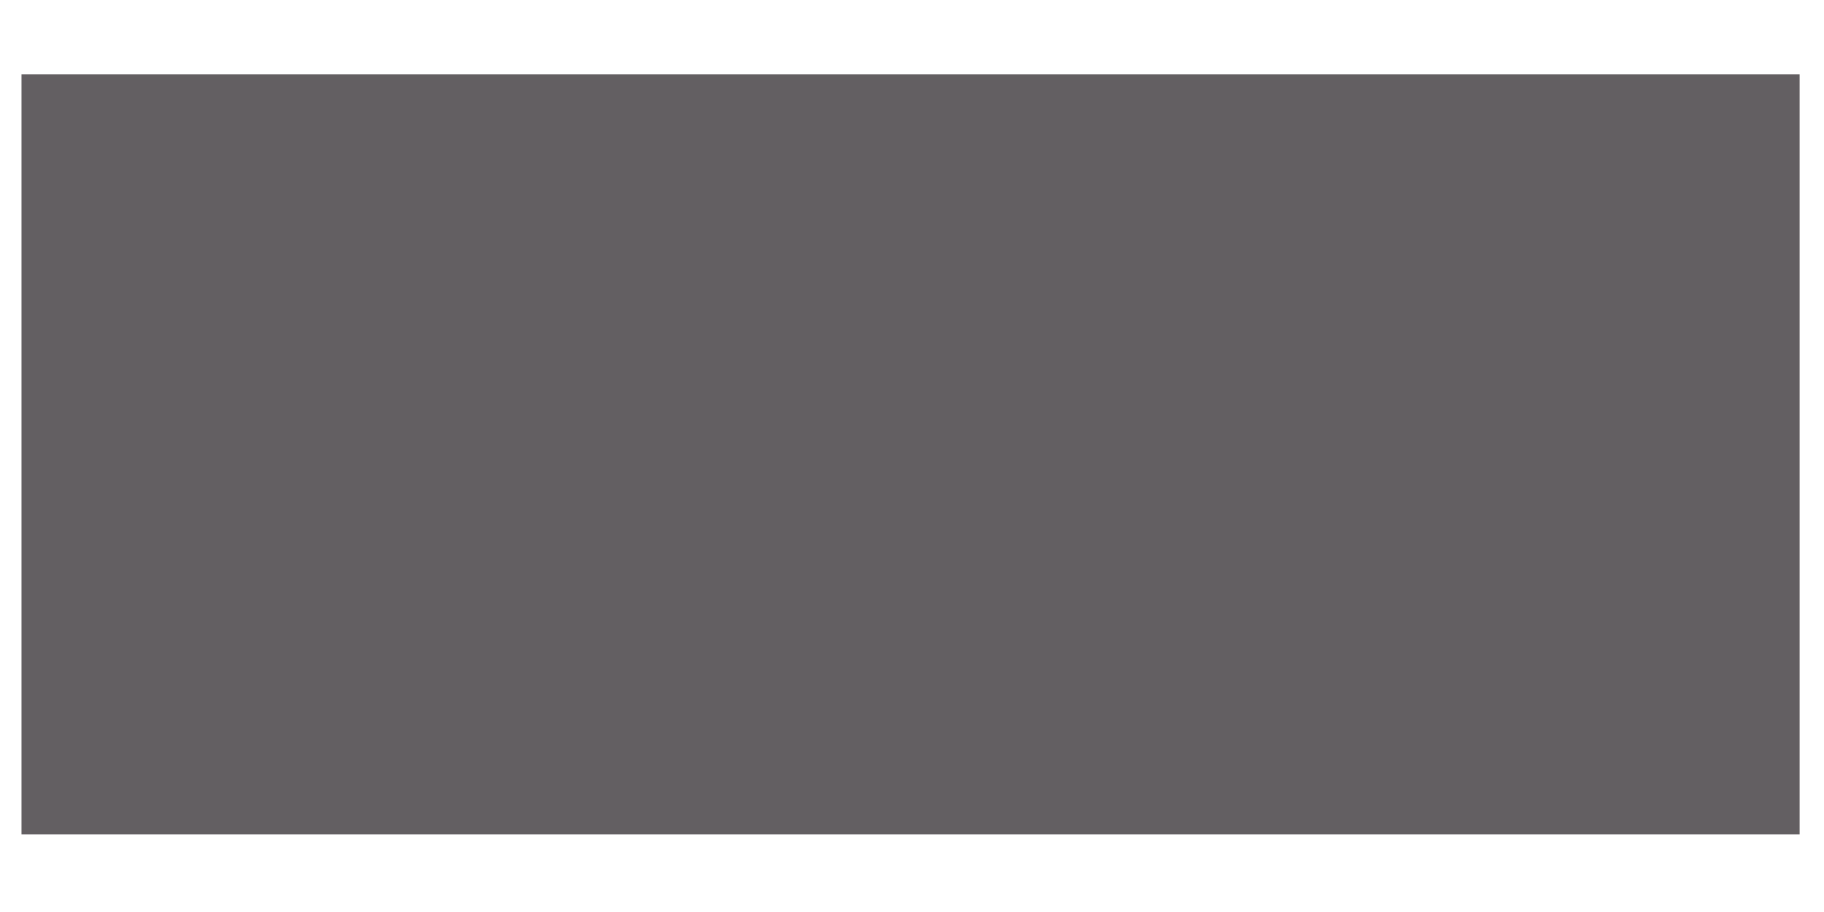 restangle grey Clipart illustration in PNG, SVG